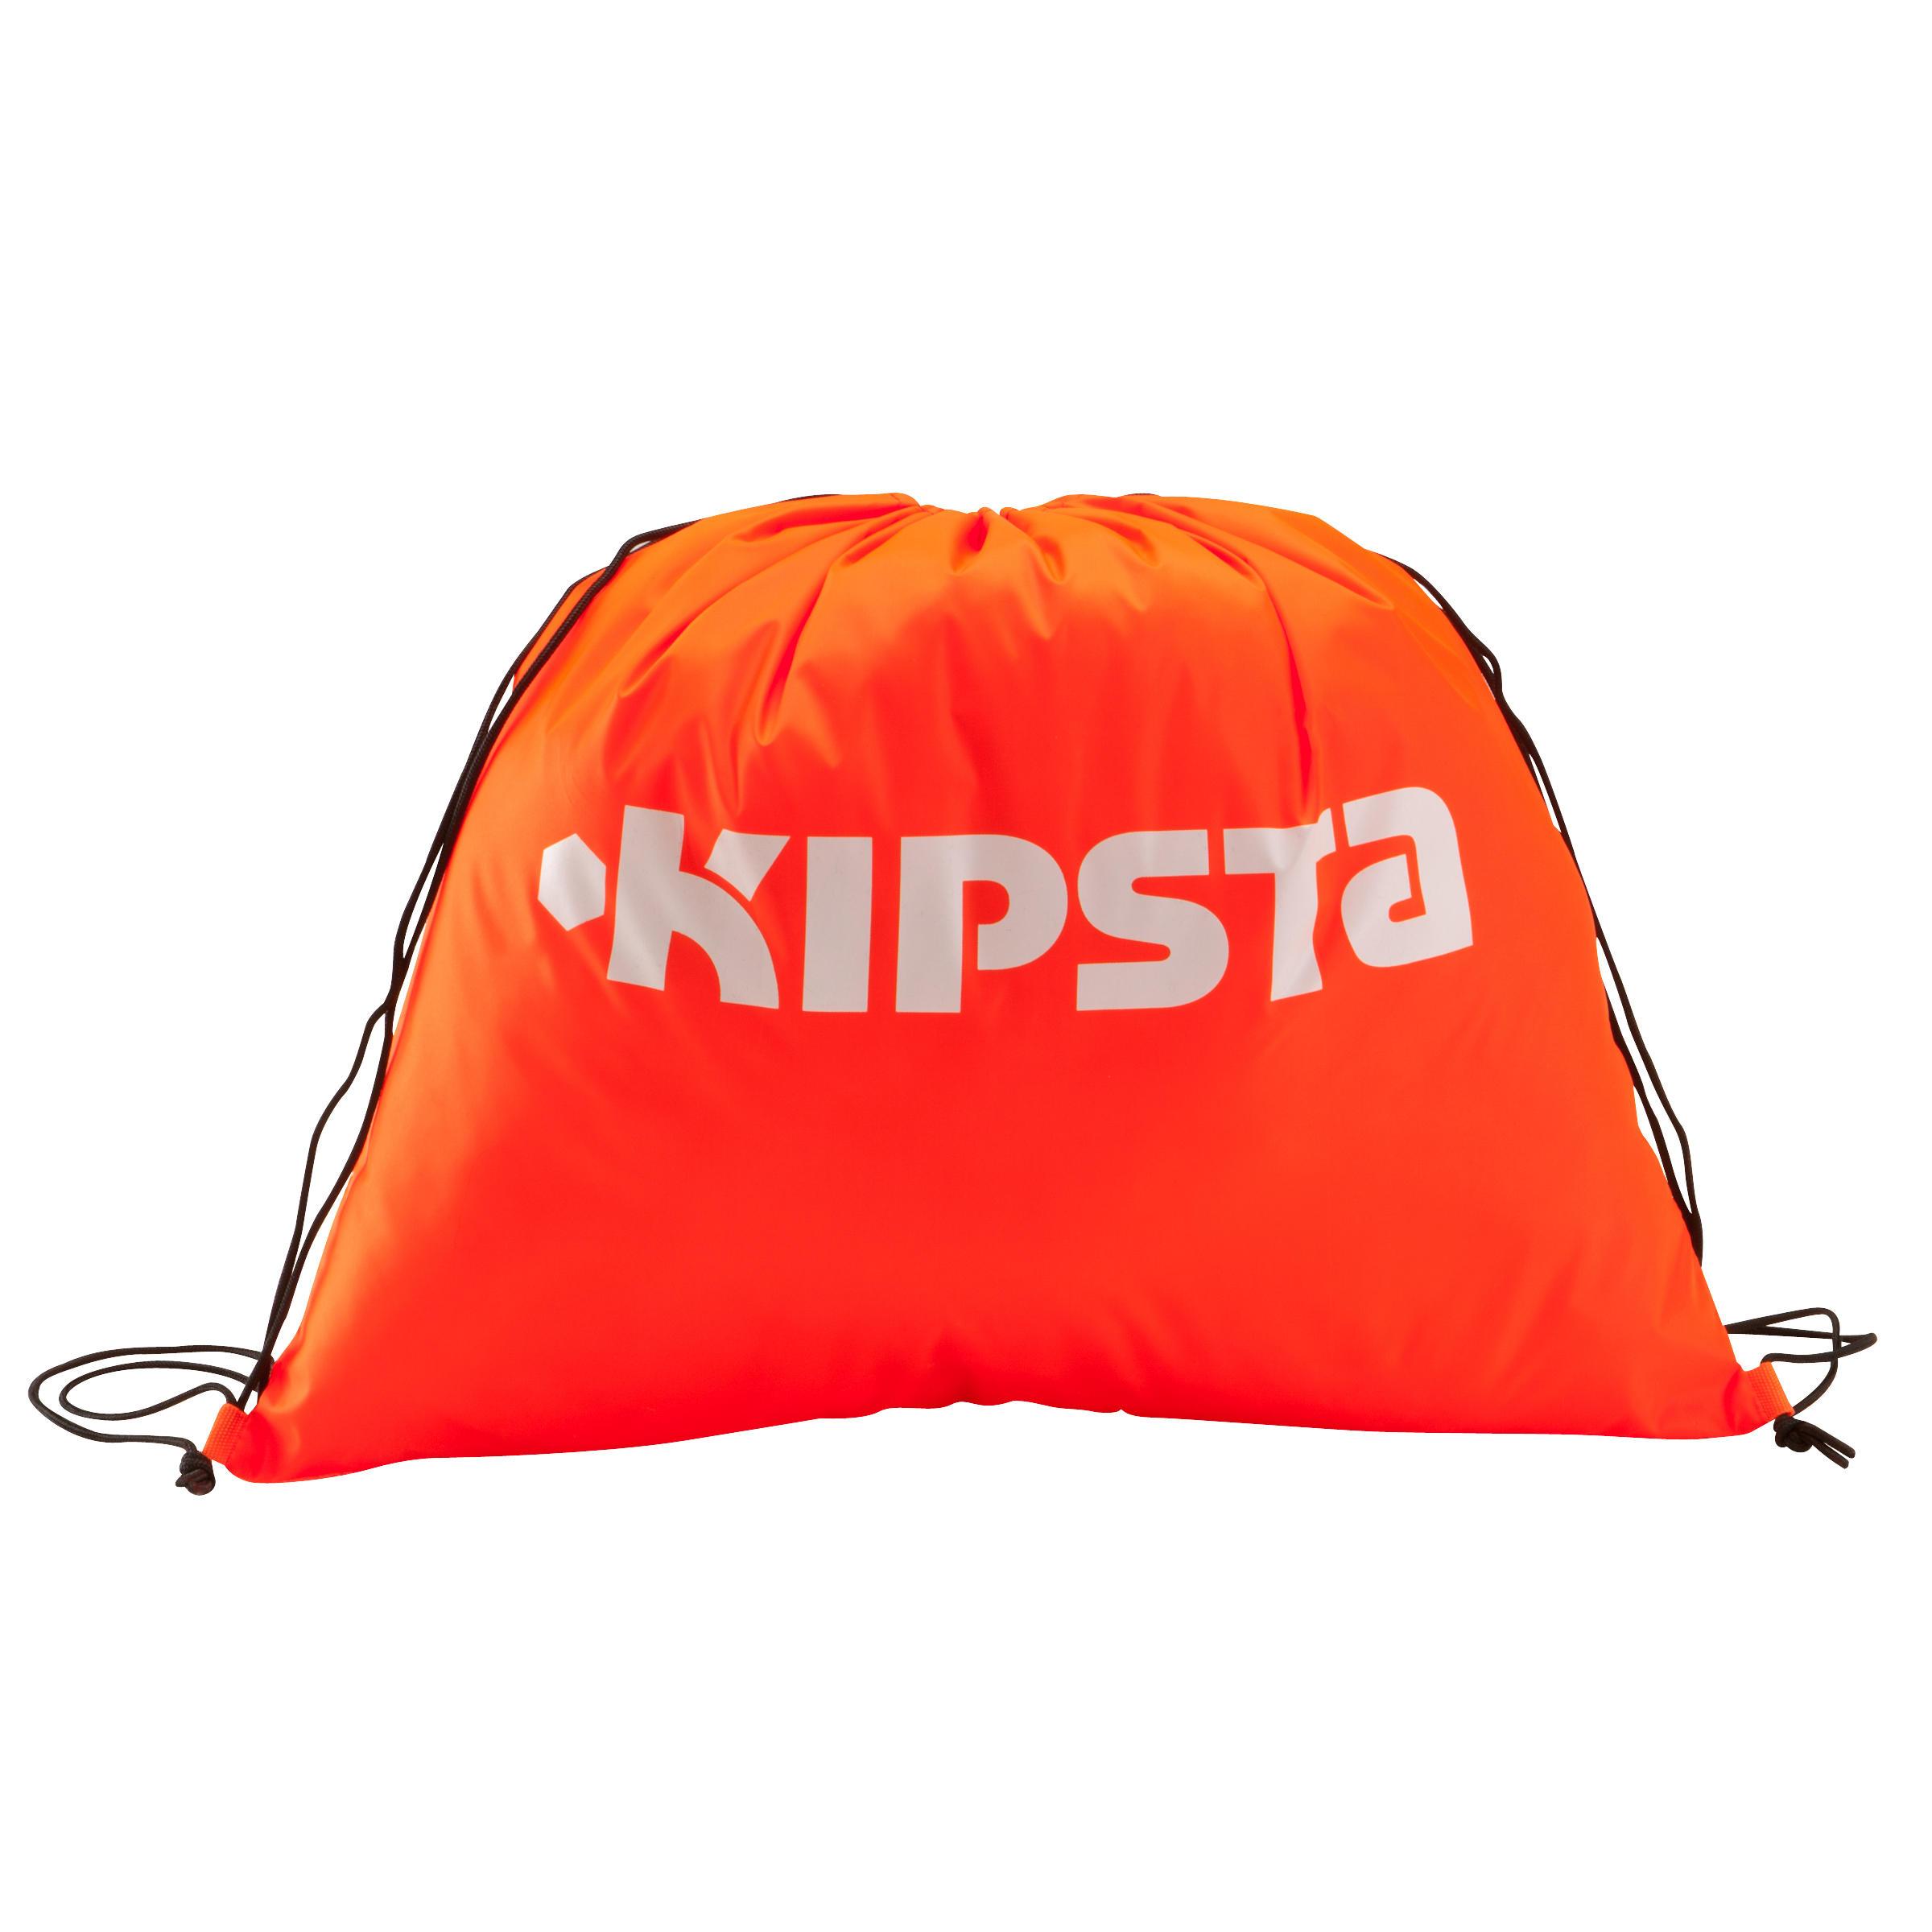 Light Team Sports Bag 15 Litres - Orange